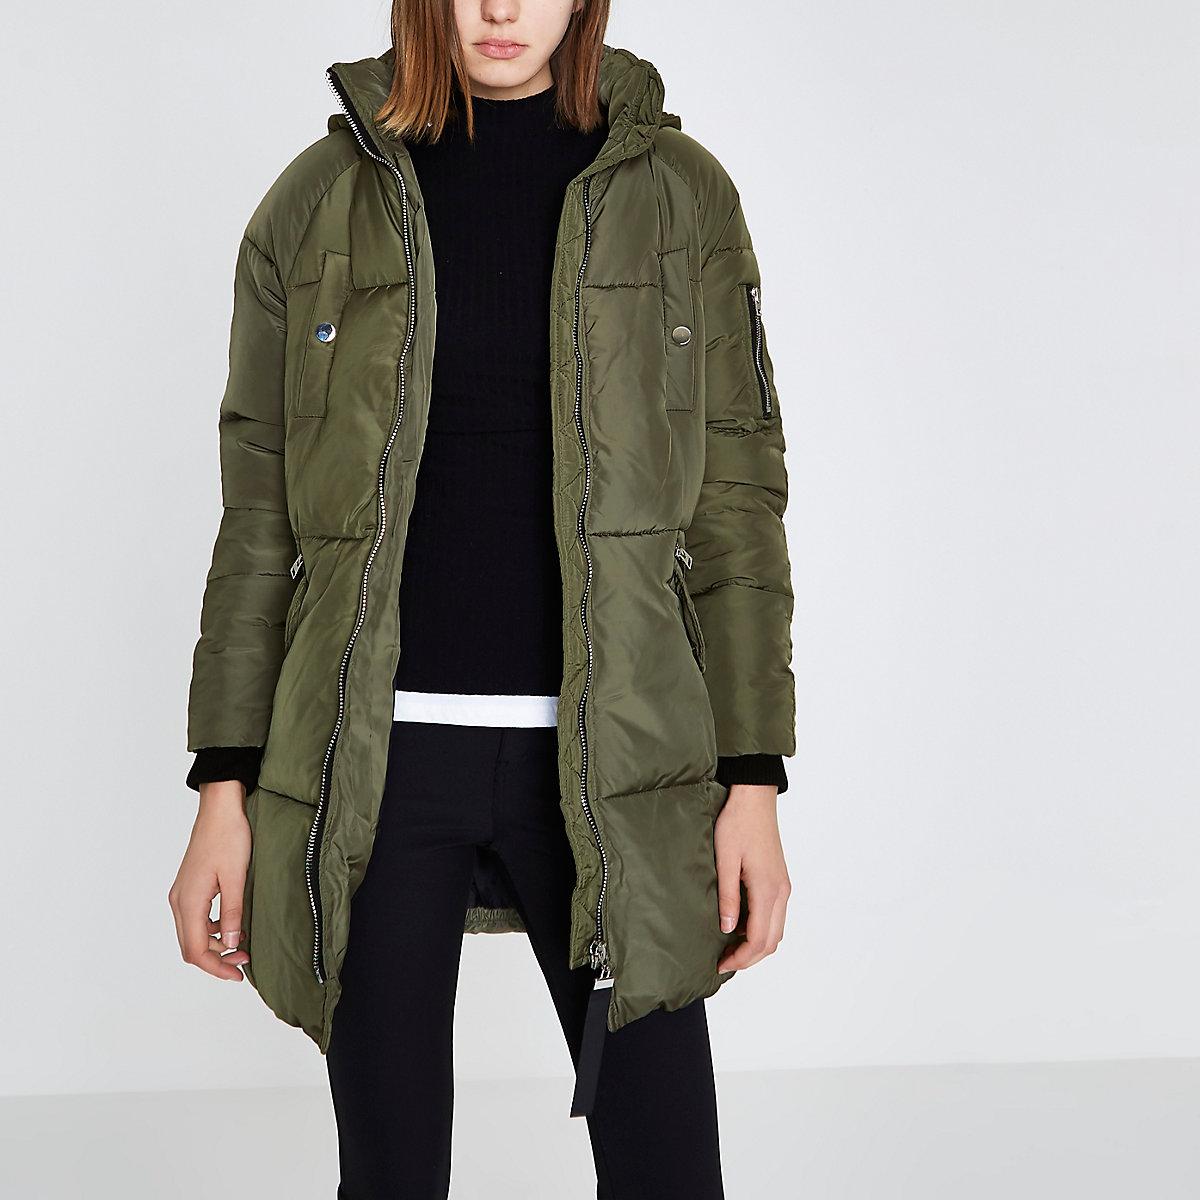 3e82f015e320 Khaki green faux fur longline puffer jacket - Coats - Coats   Jackets -  women